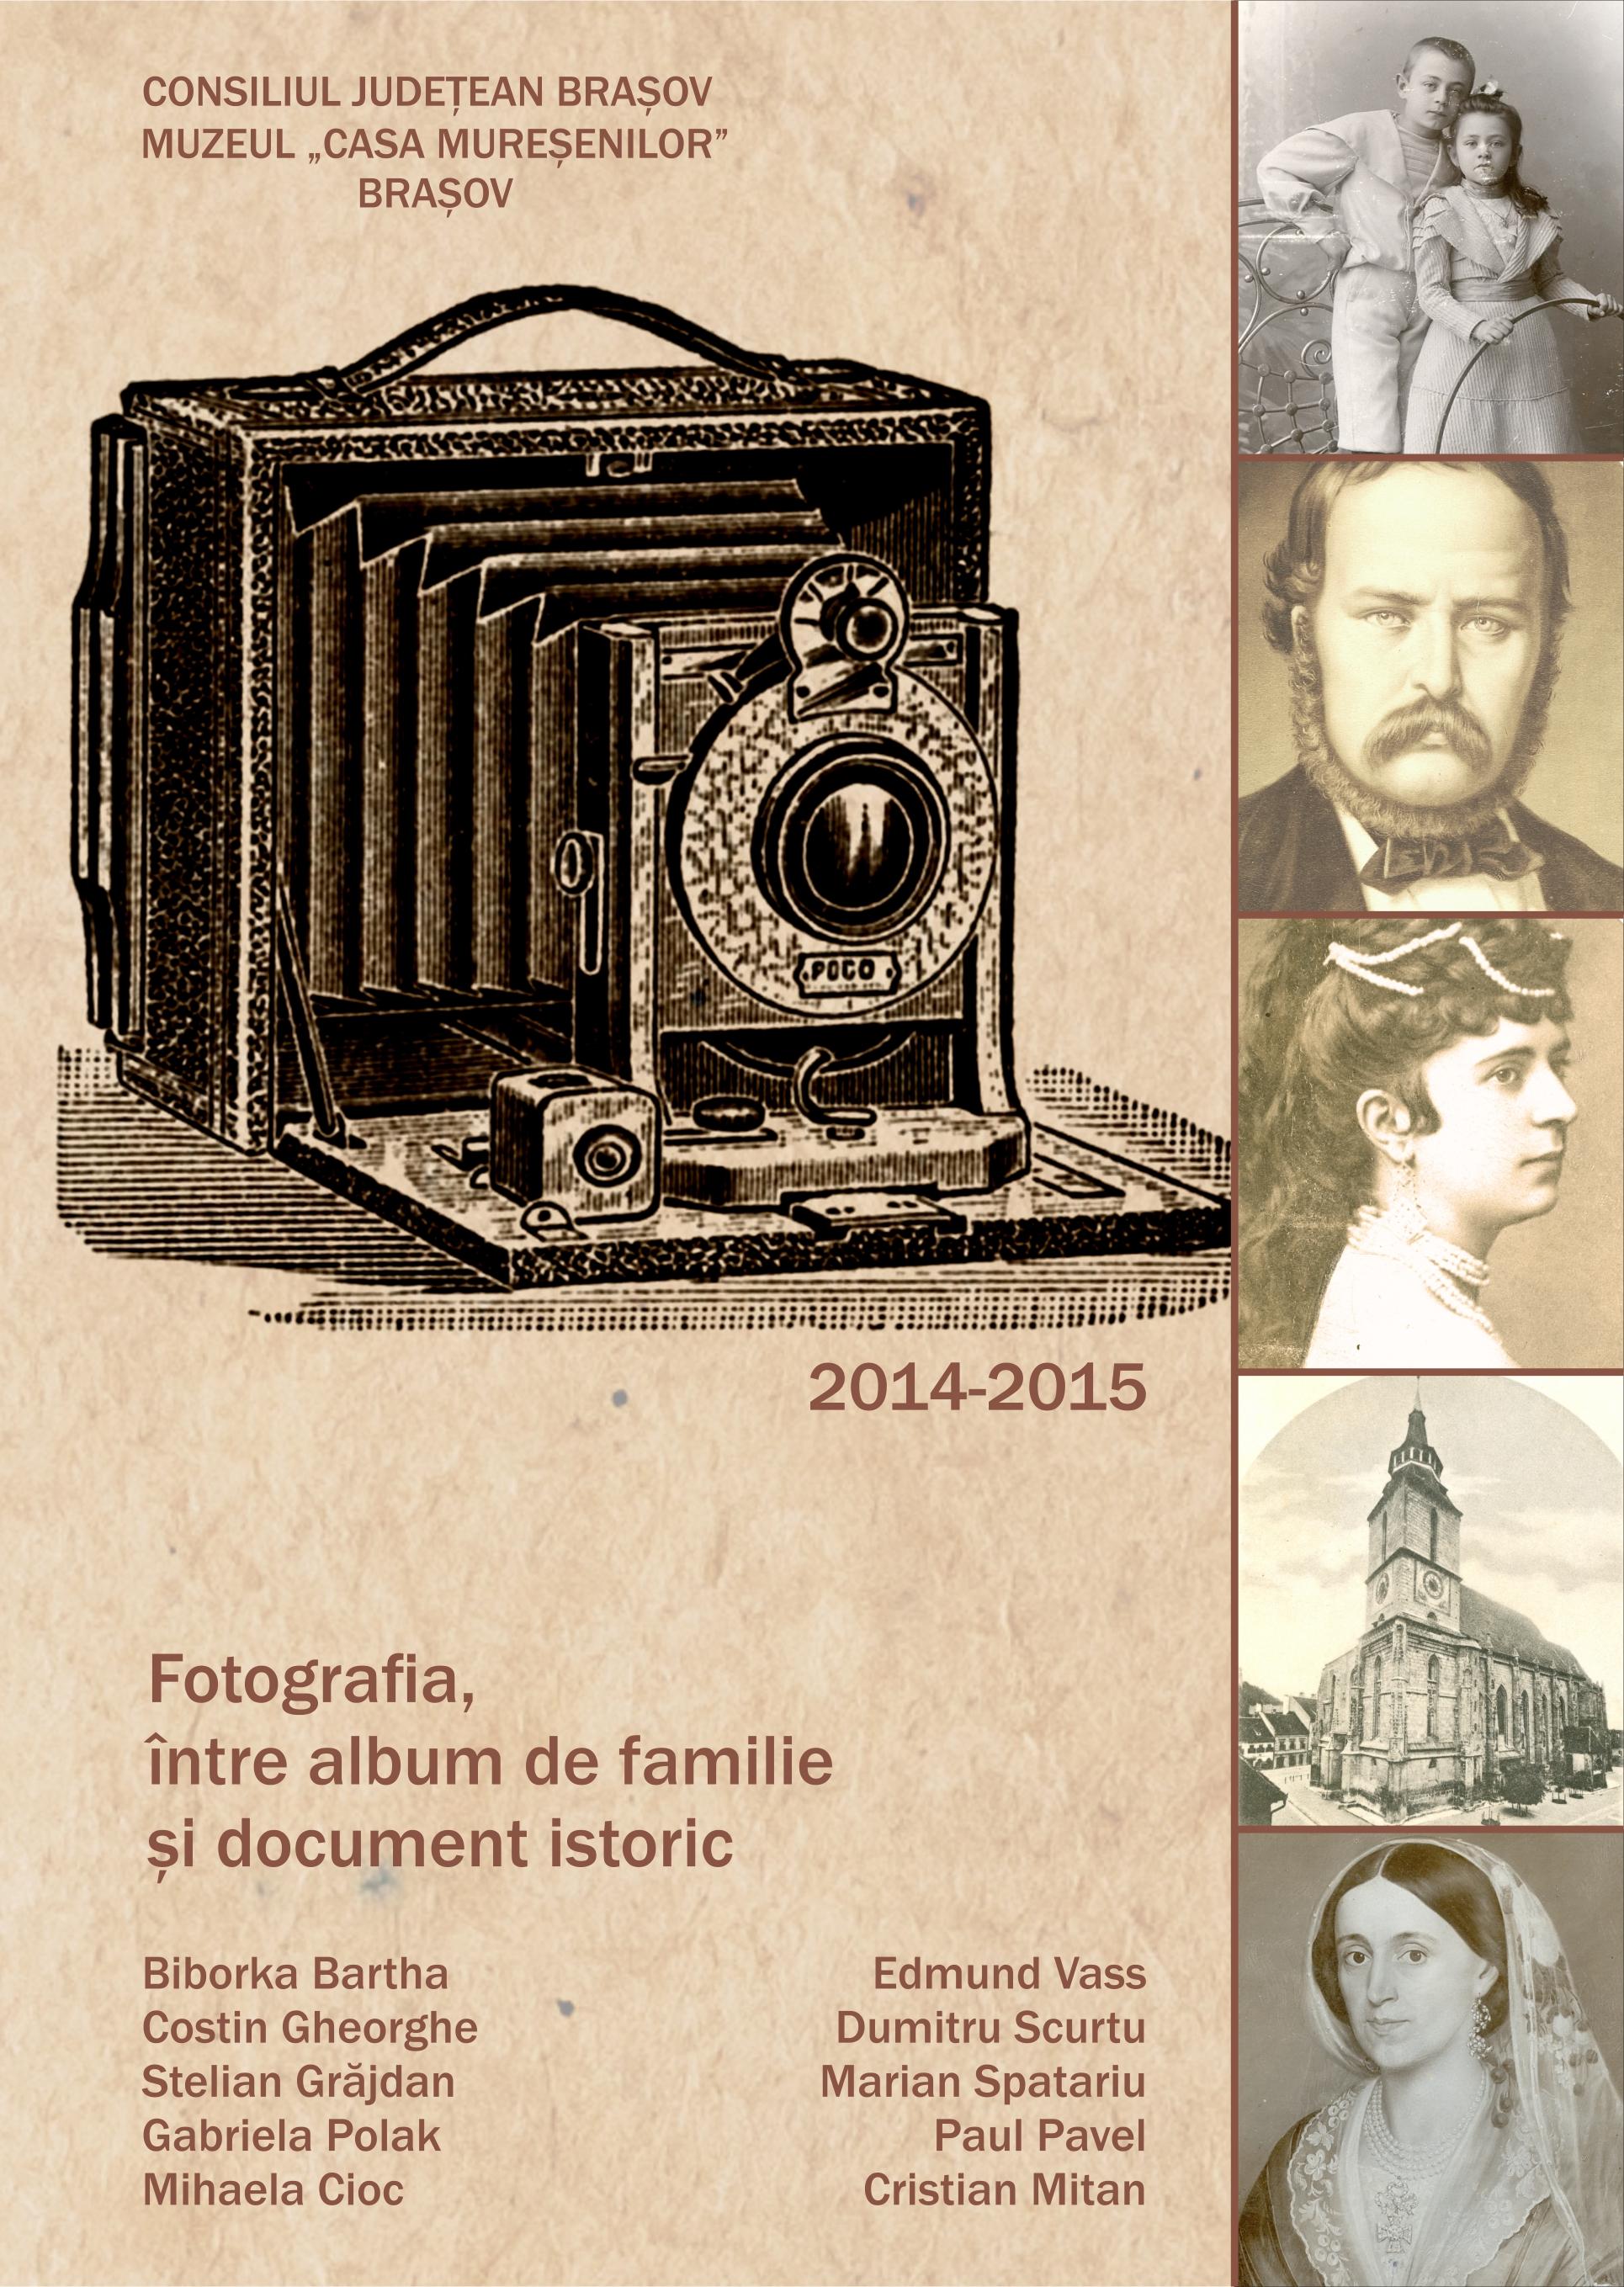 Fotografia - între album de familie si document istoric